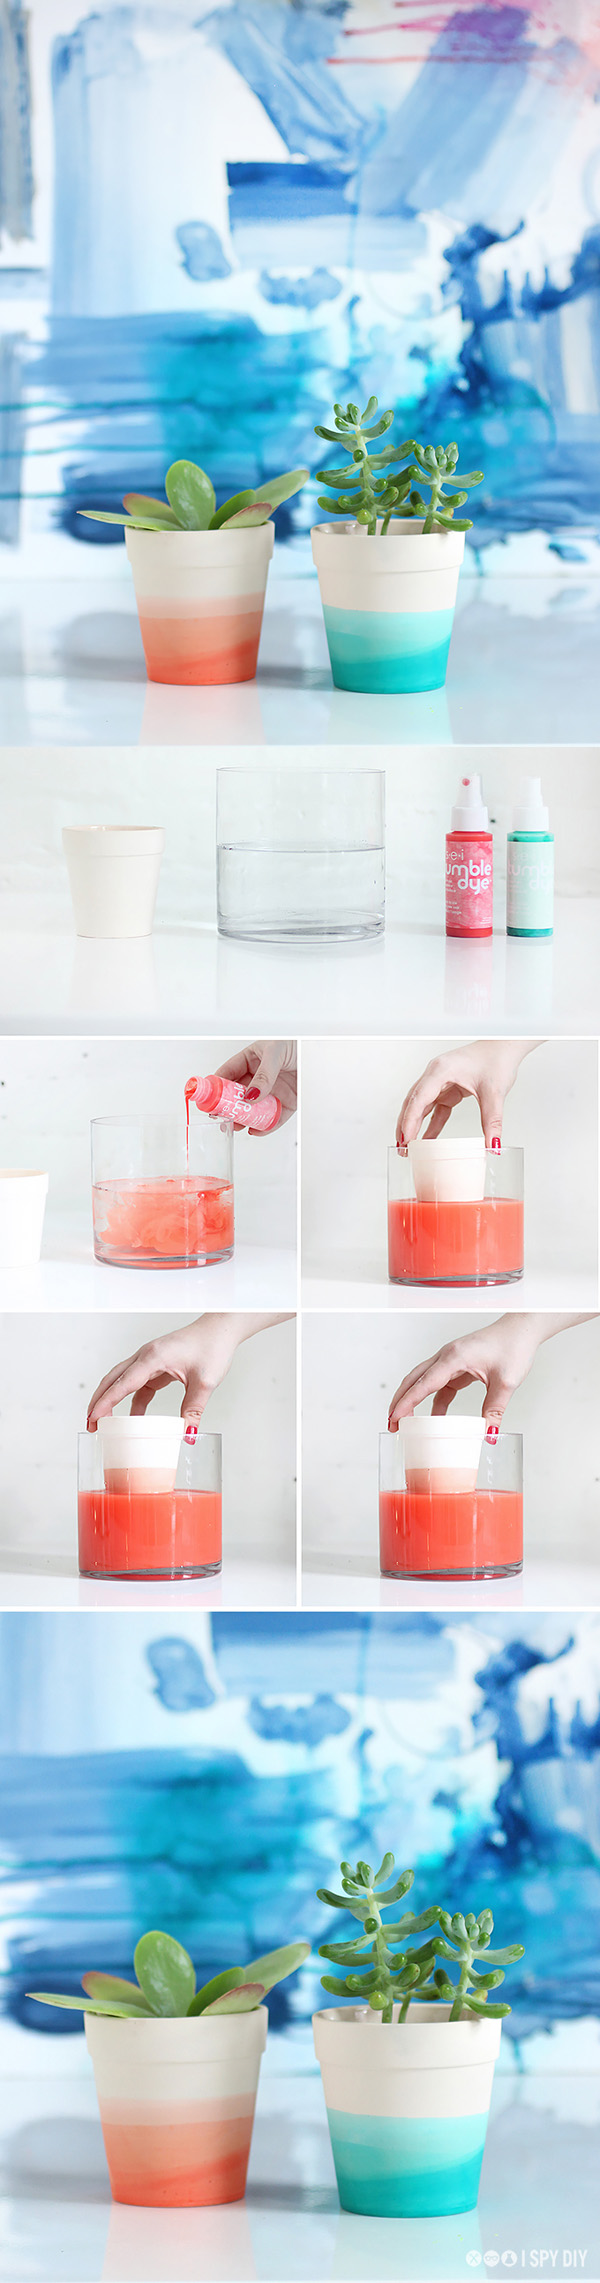 DIY ιδέες με γλάστρες15